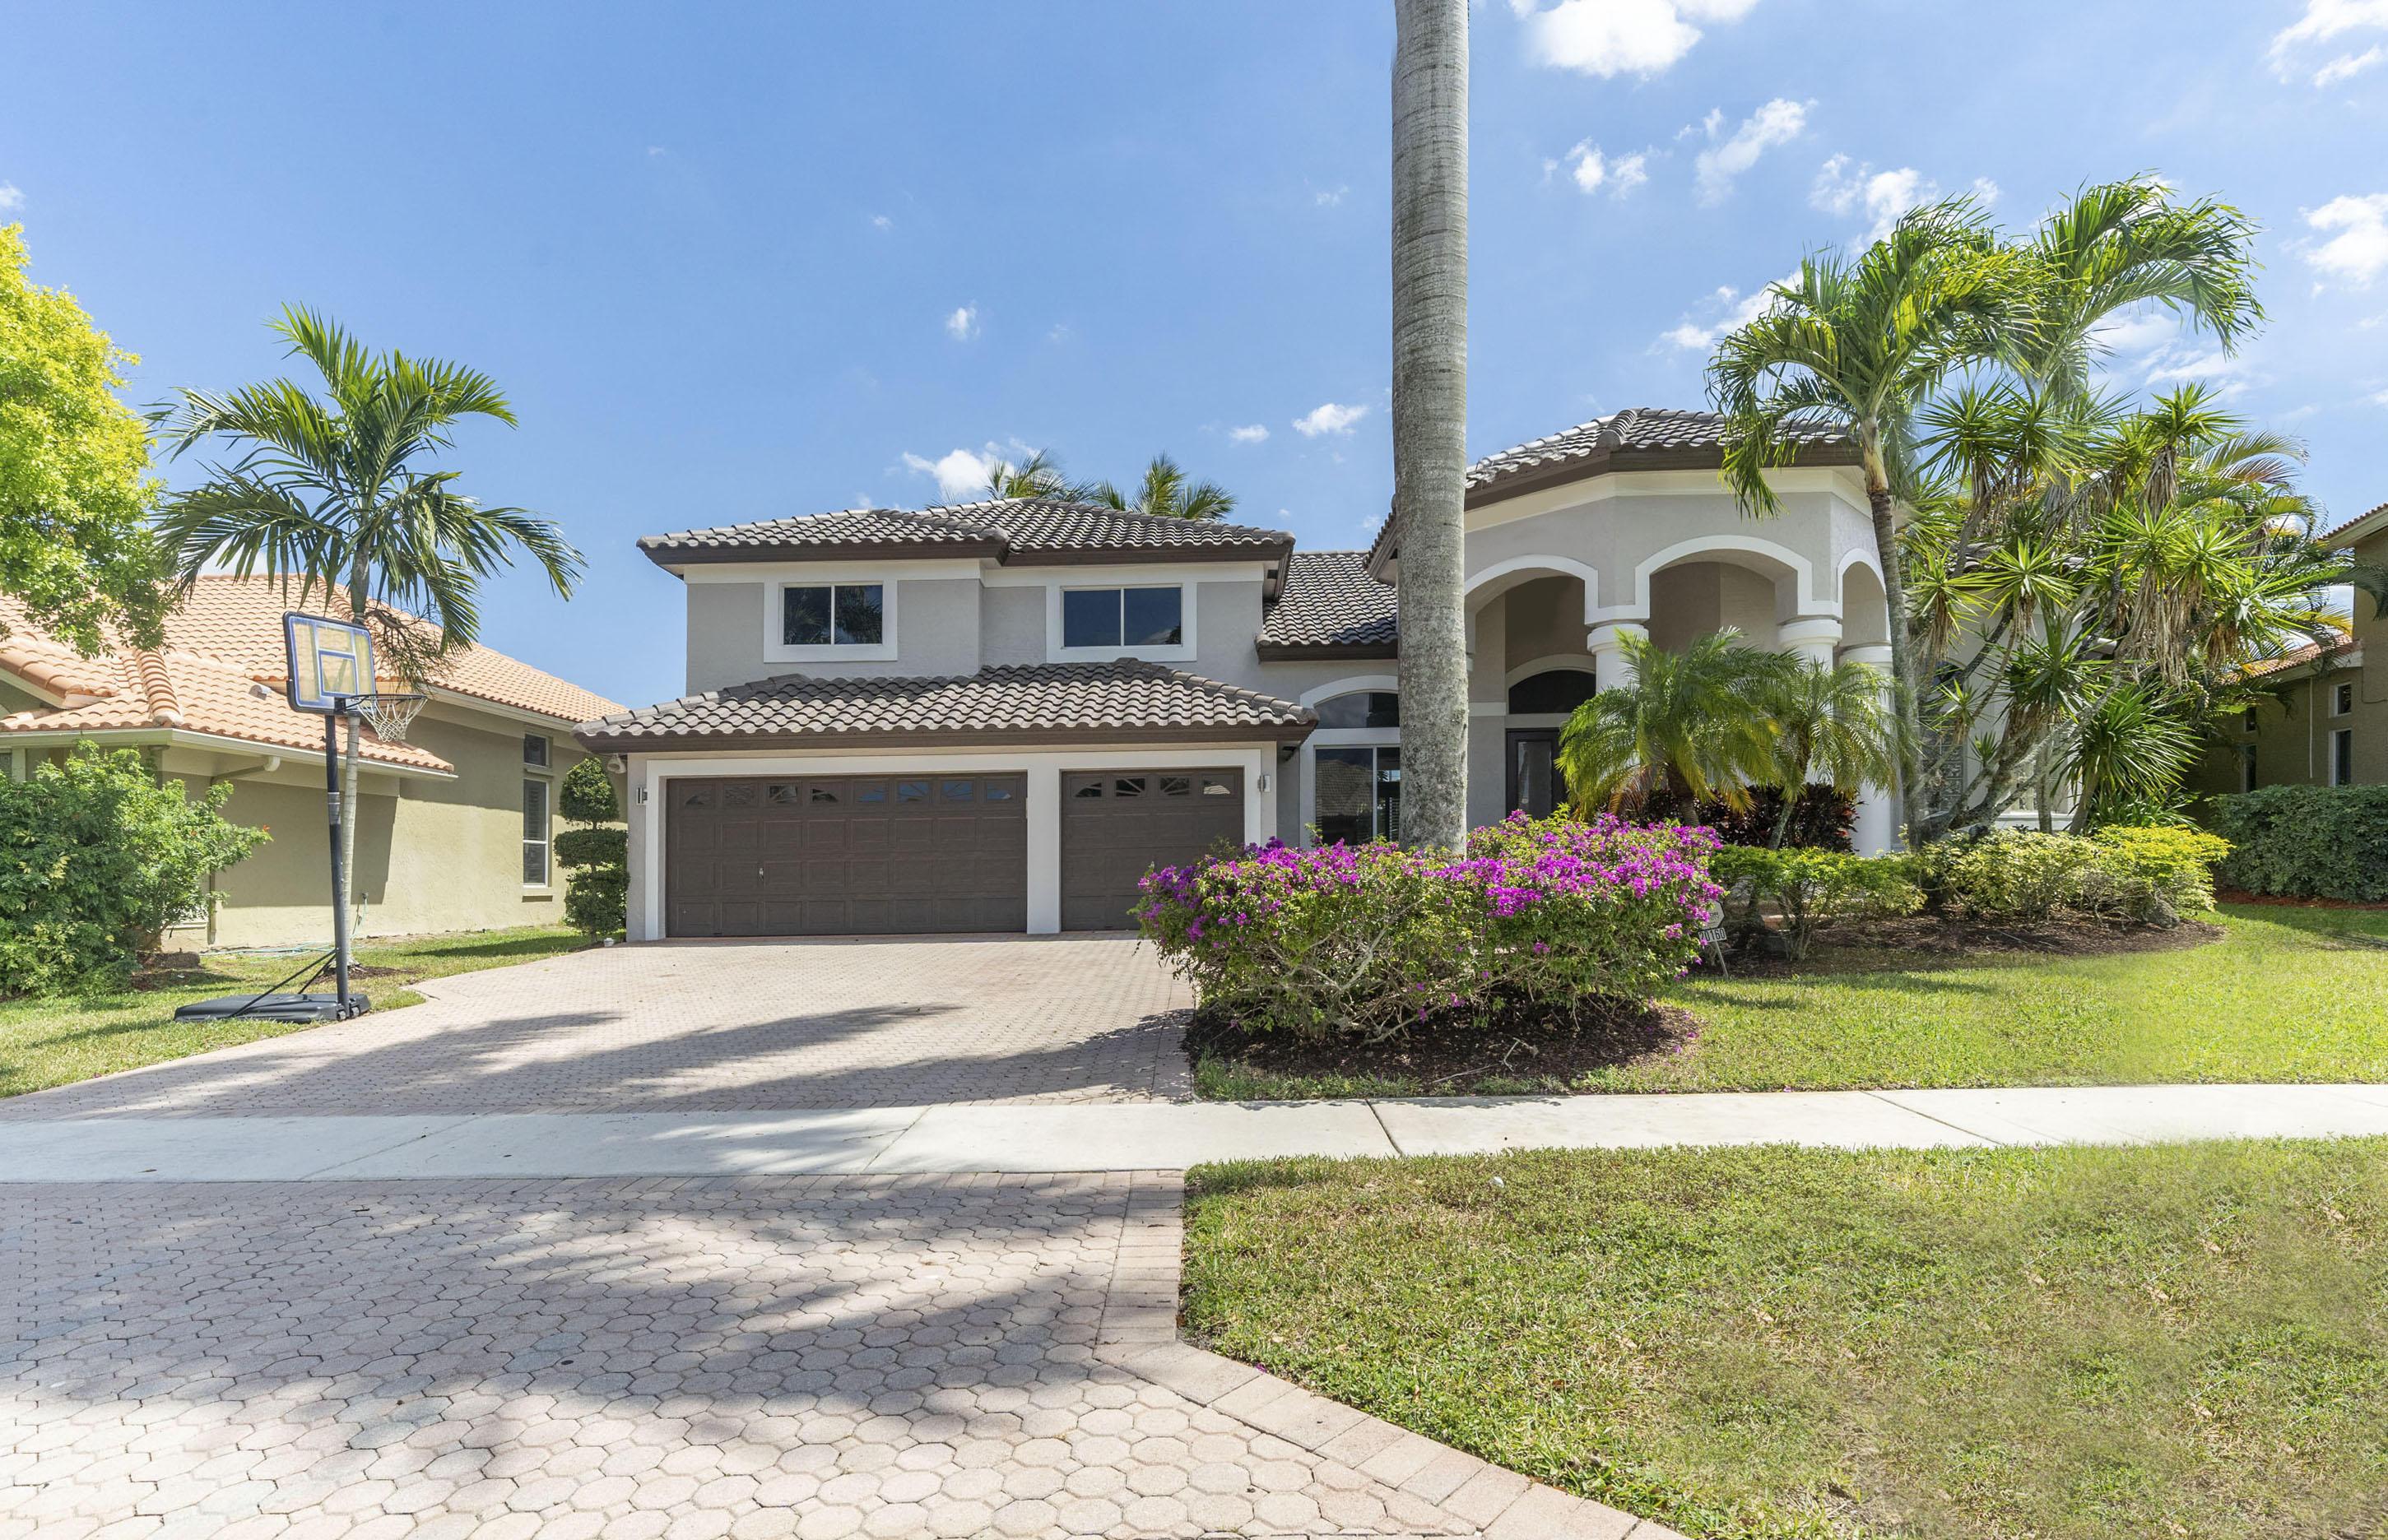 Photo of 20160 Palm Island Drive, Boca Raton, FL 33498